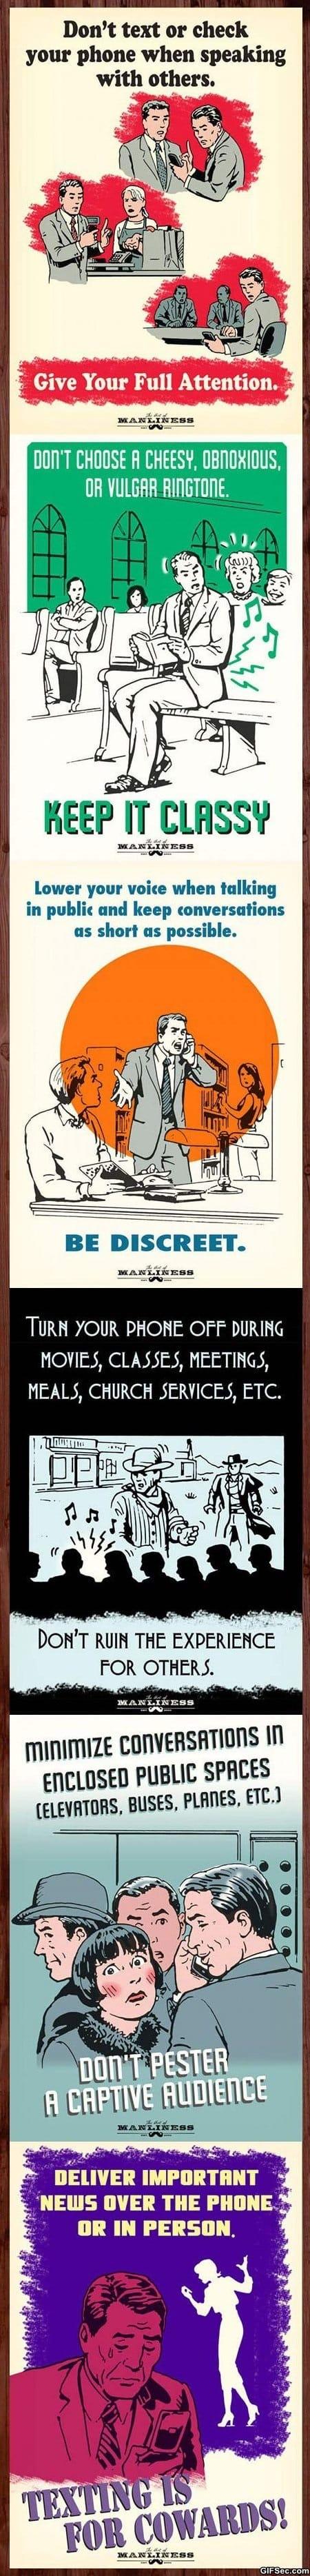 lol-smart-phones-but-dumb-users